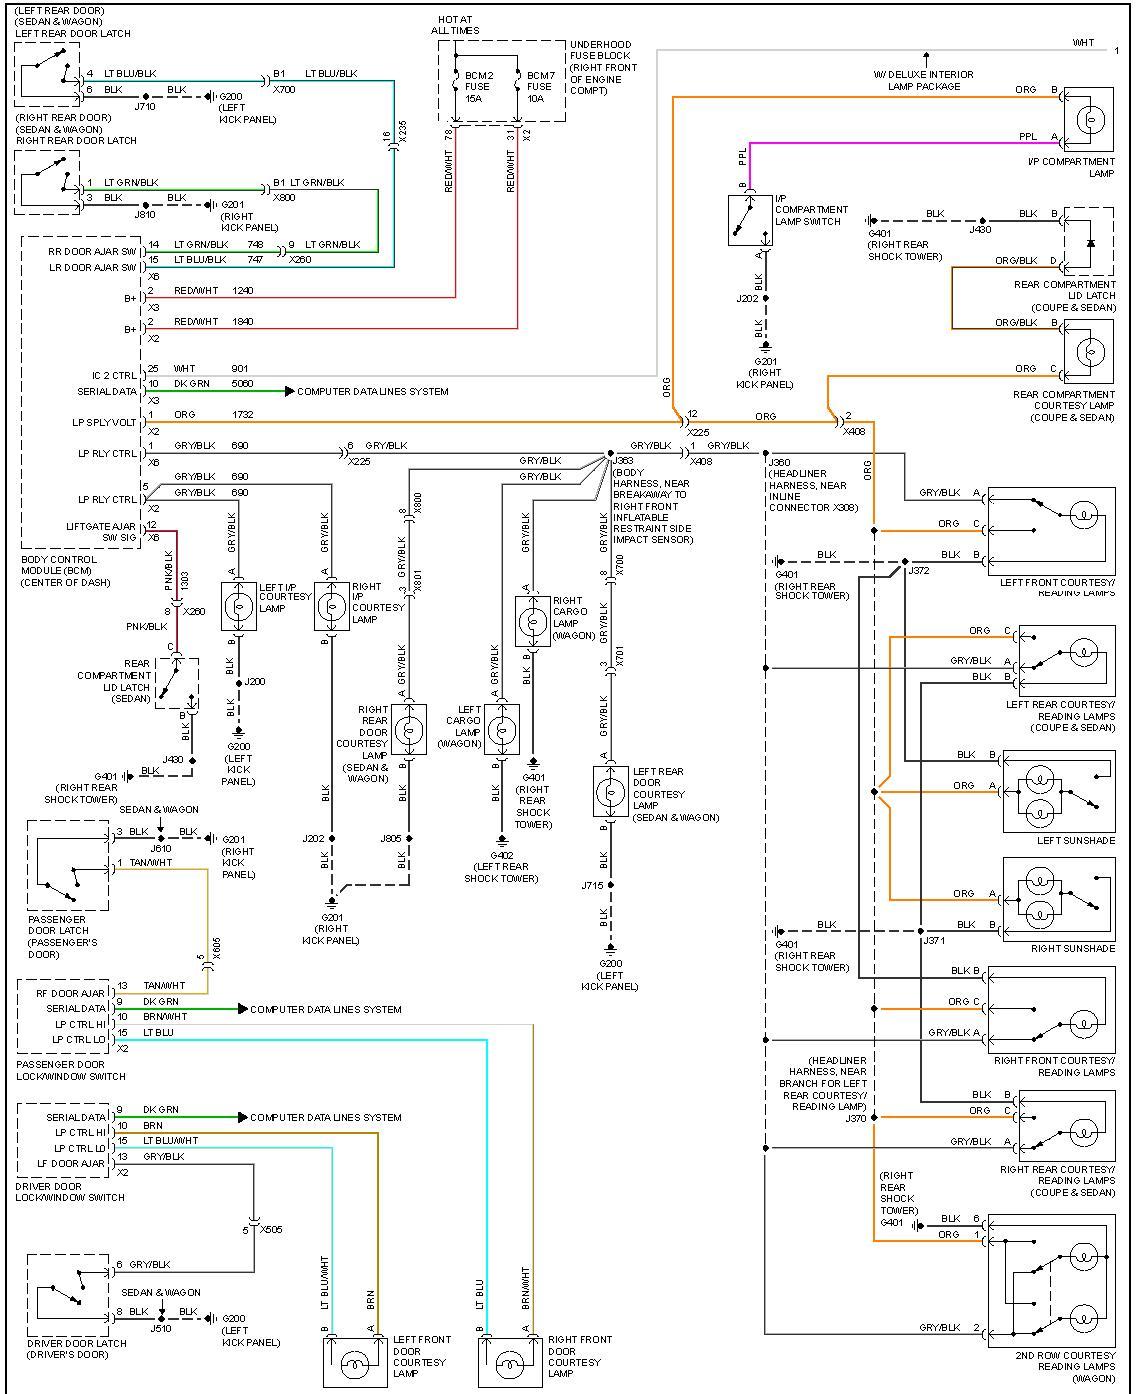 2014 Cadillac Cts V Wiring Diagram Unimount Wiring Diagram For Wiring Diagram Schematics